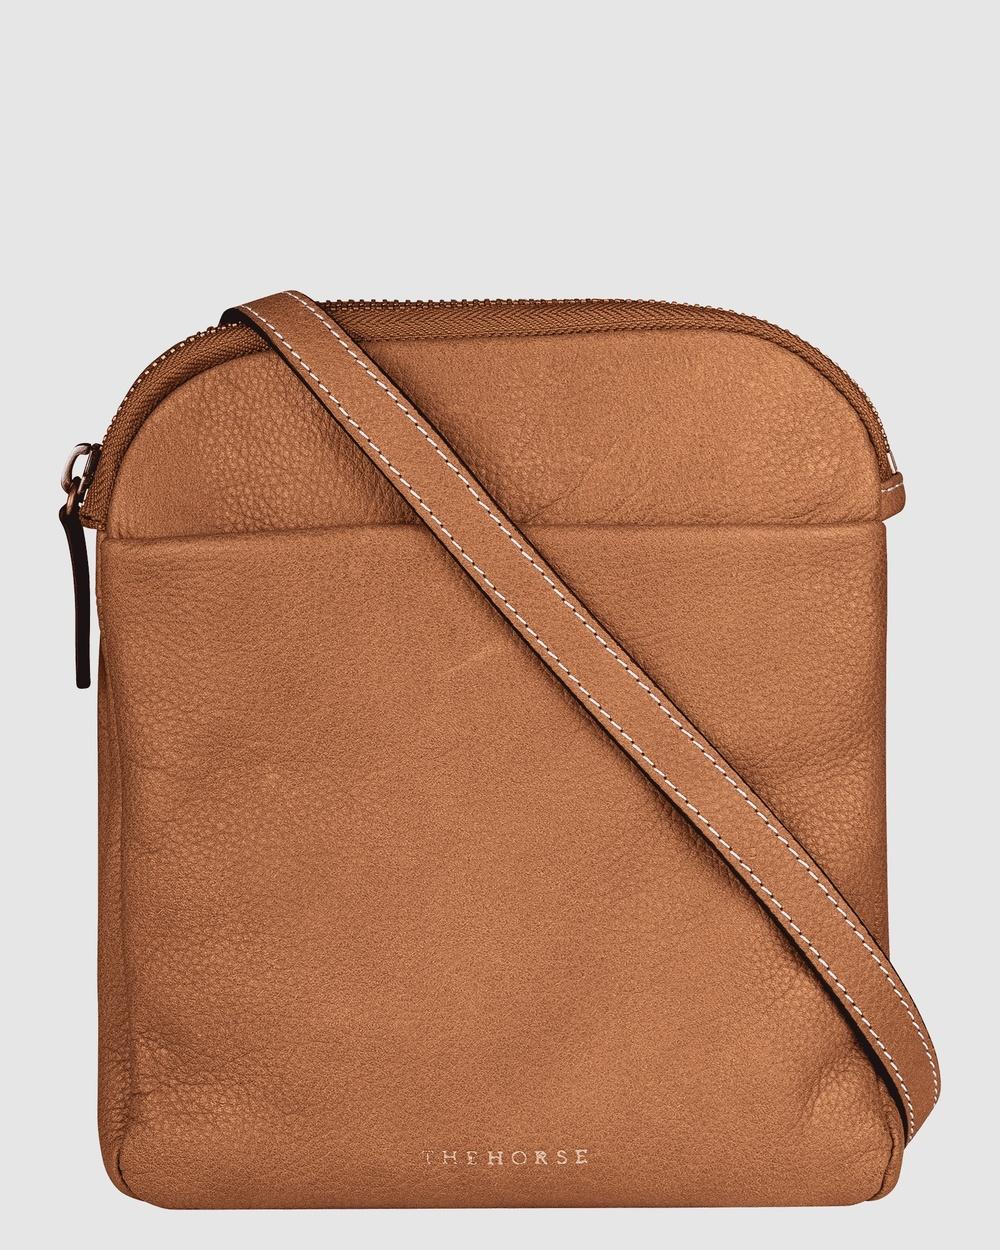 The Horse Patty Bag Bags Tan